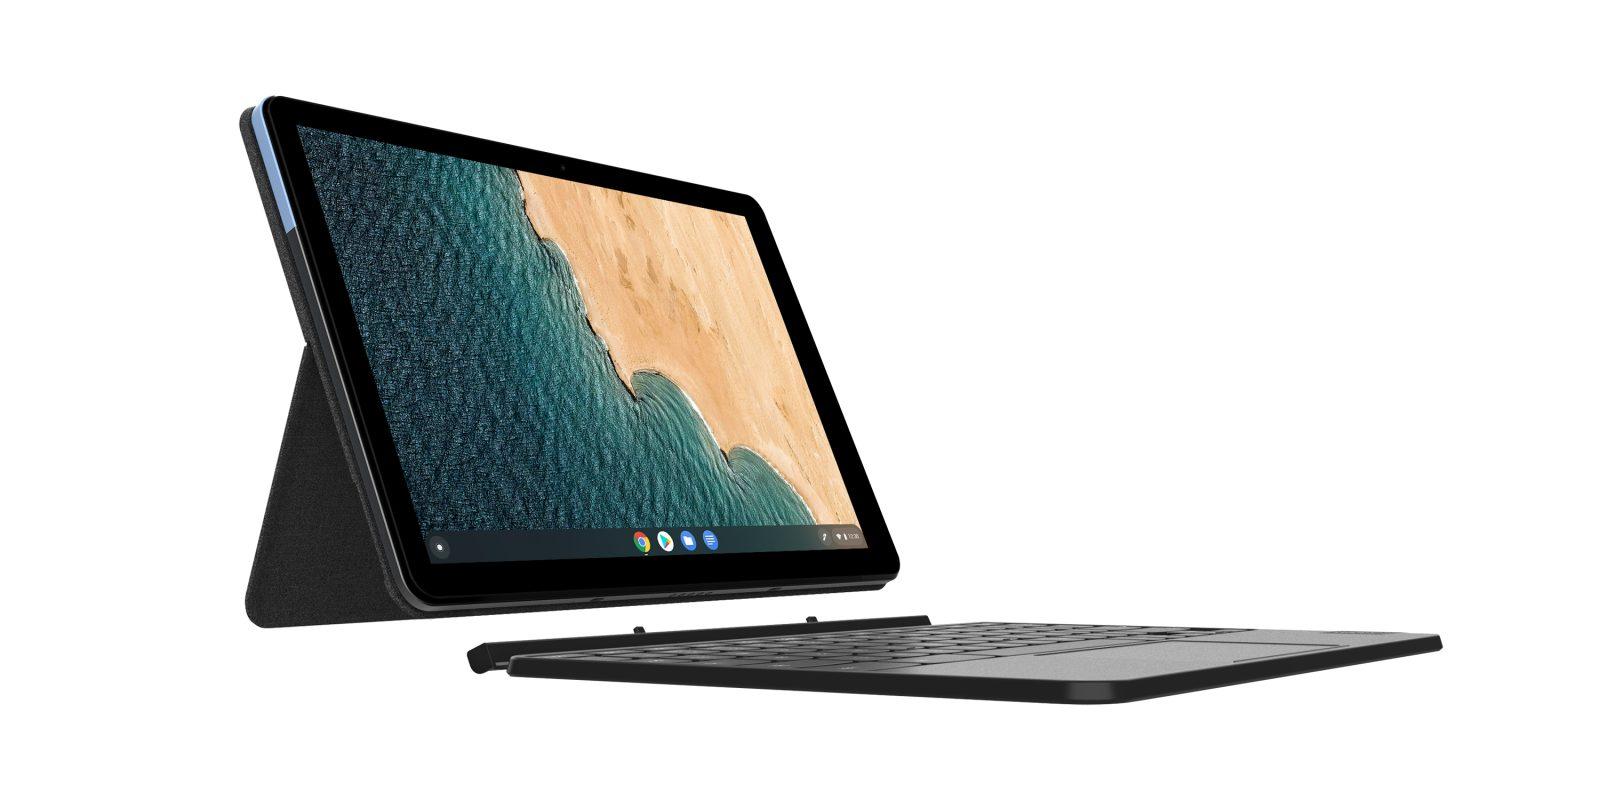 Lenovo IdeaPad Duet Chromebook looks like a good tablet - 9to5Google